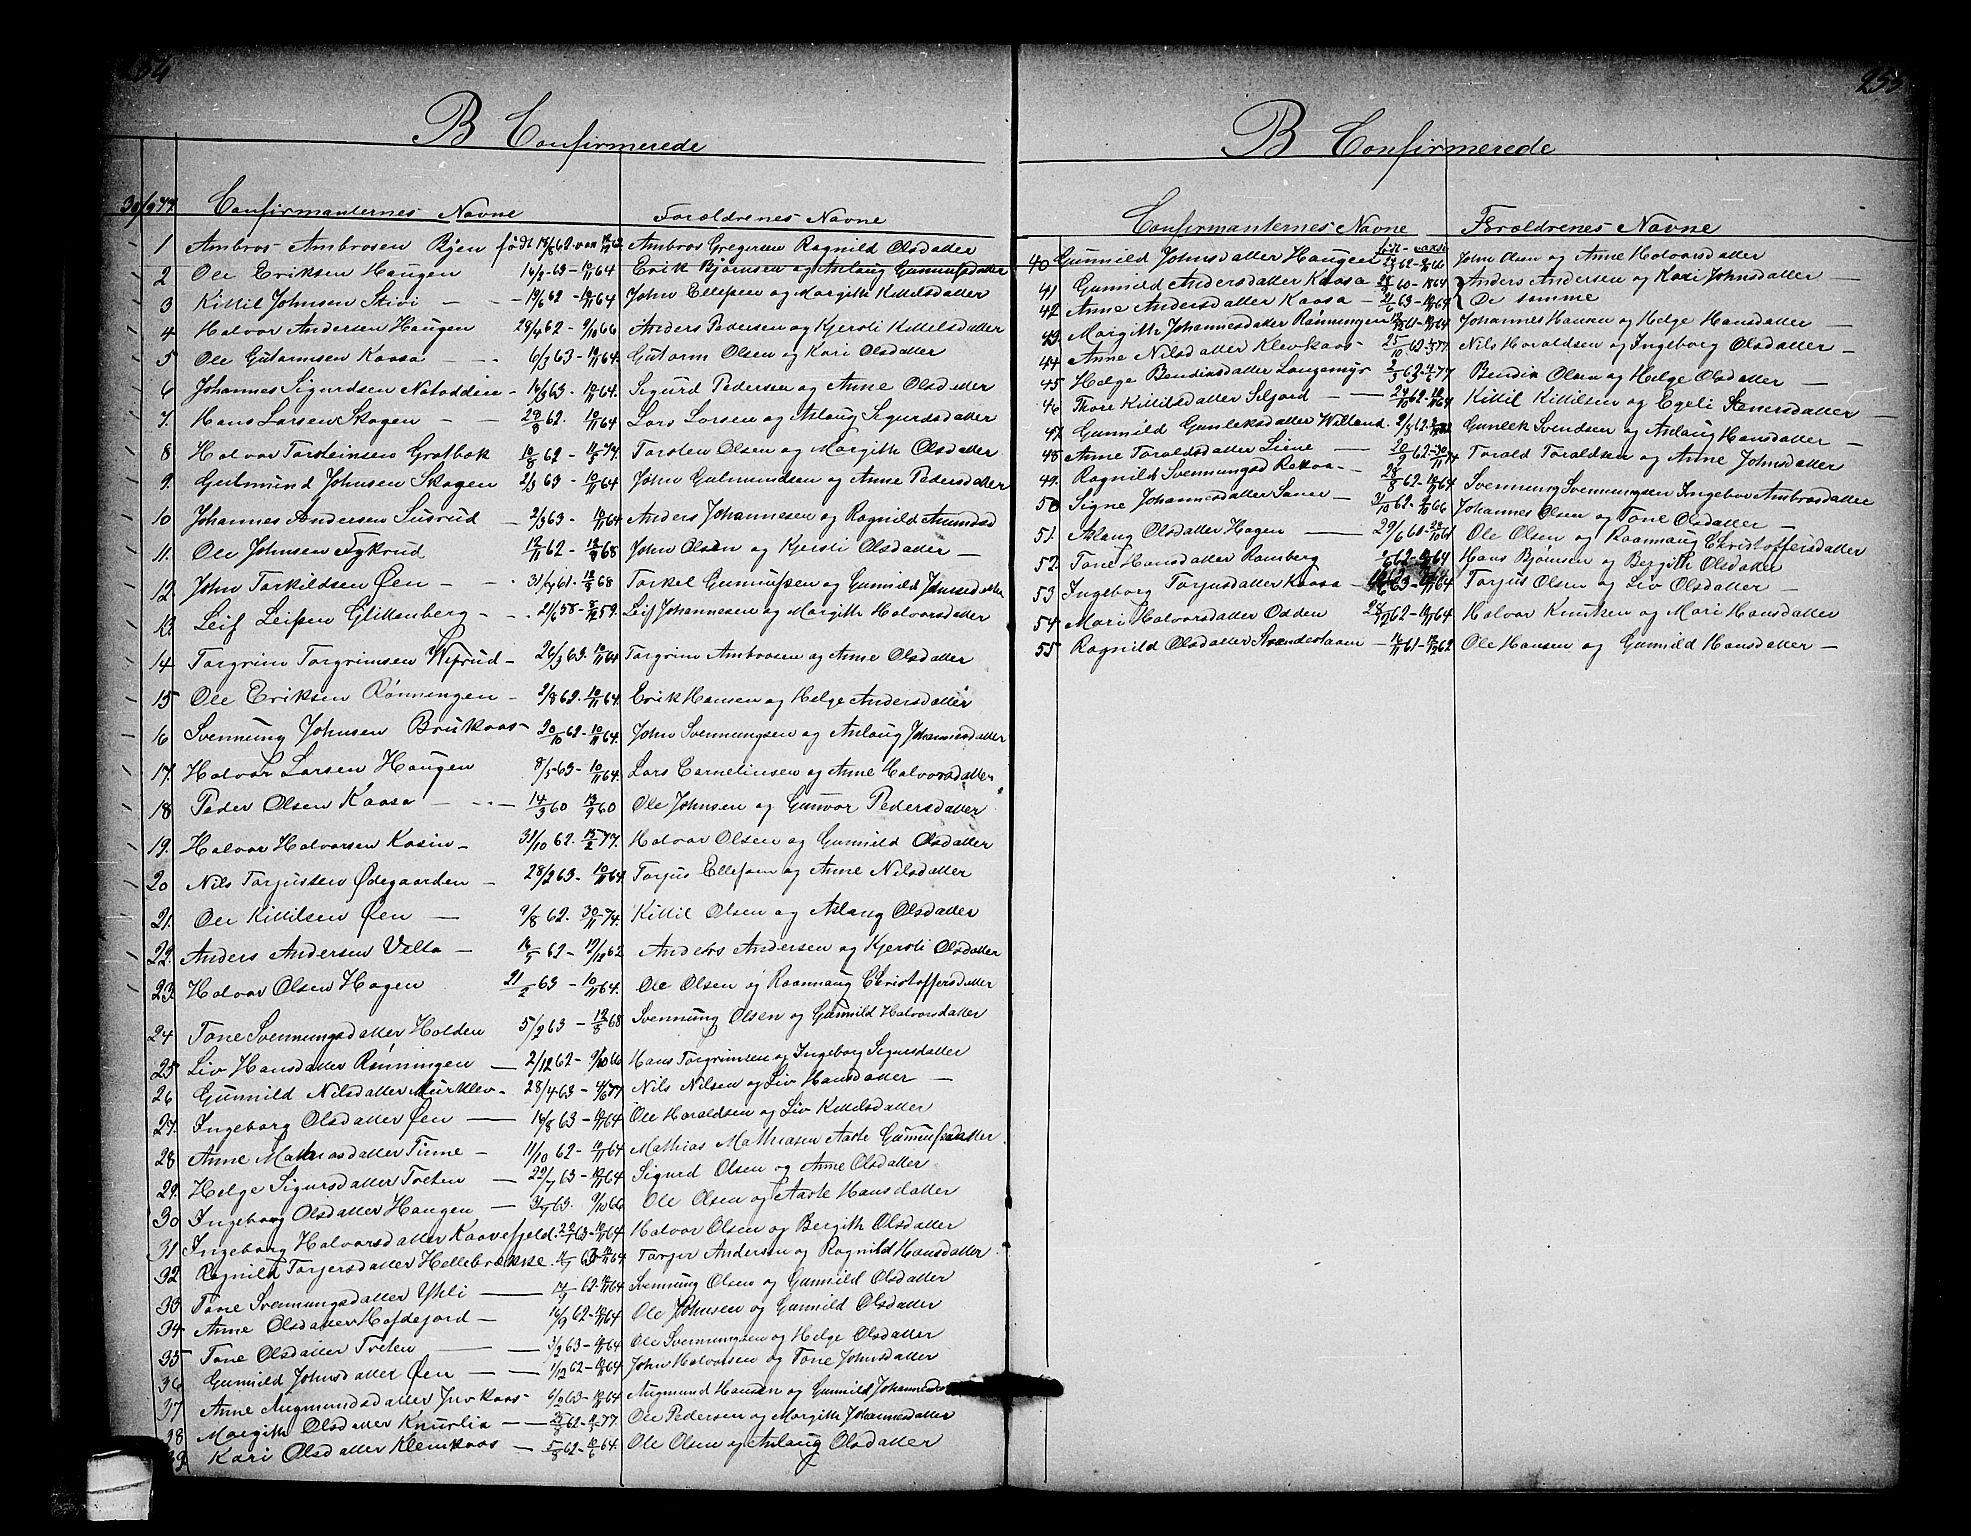 SAKO, Heddal kirkebøker, G/Ga/L0001: Klokkerbok nr. I 1, 1866-1878, s. 254-255